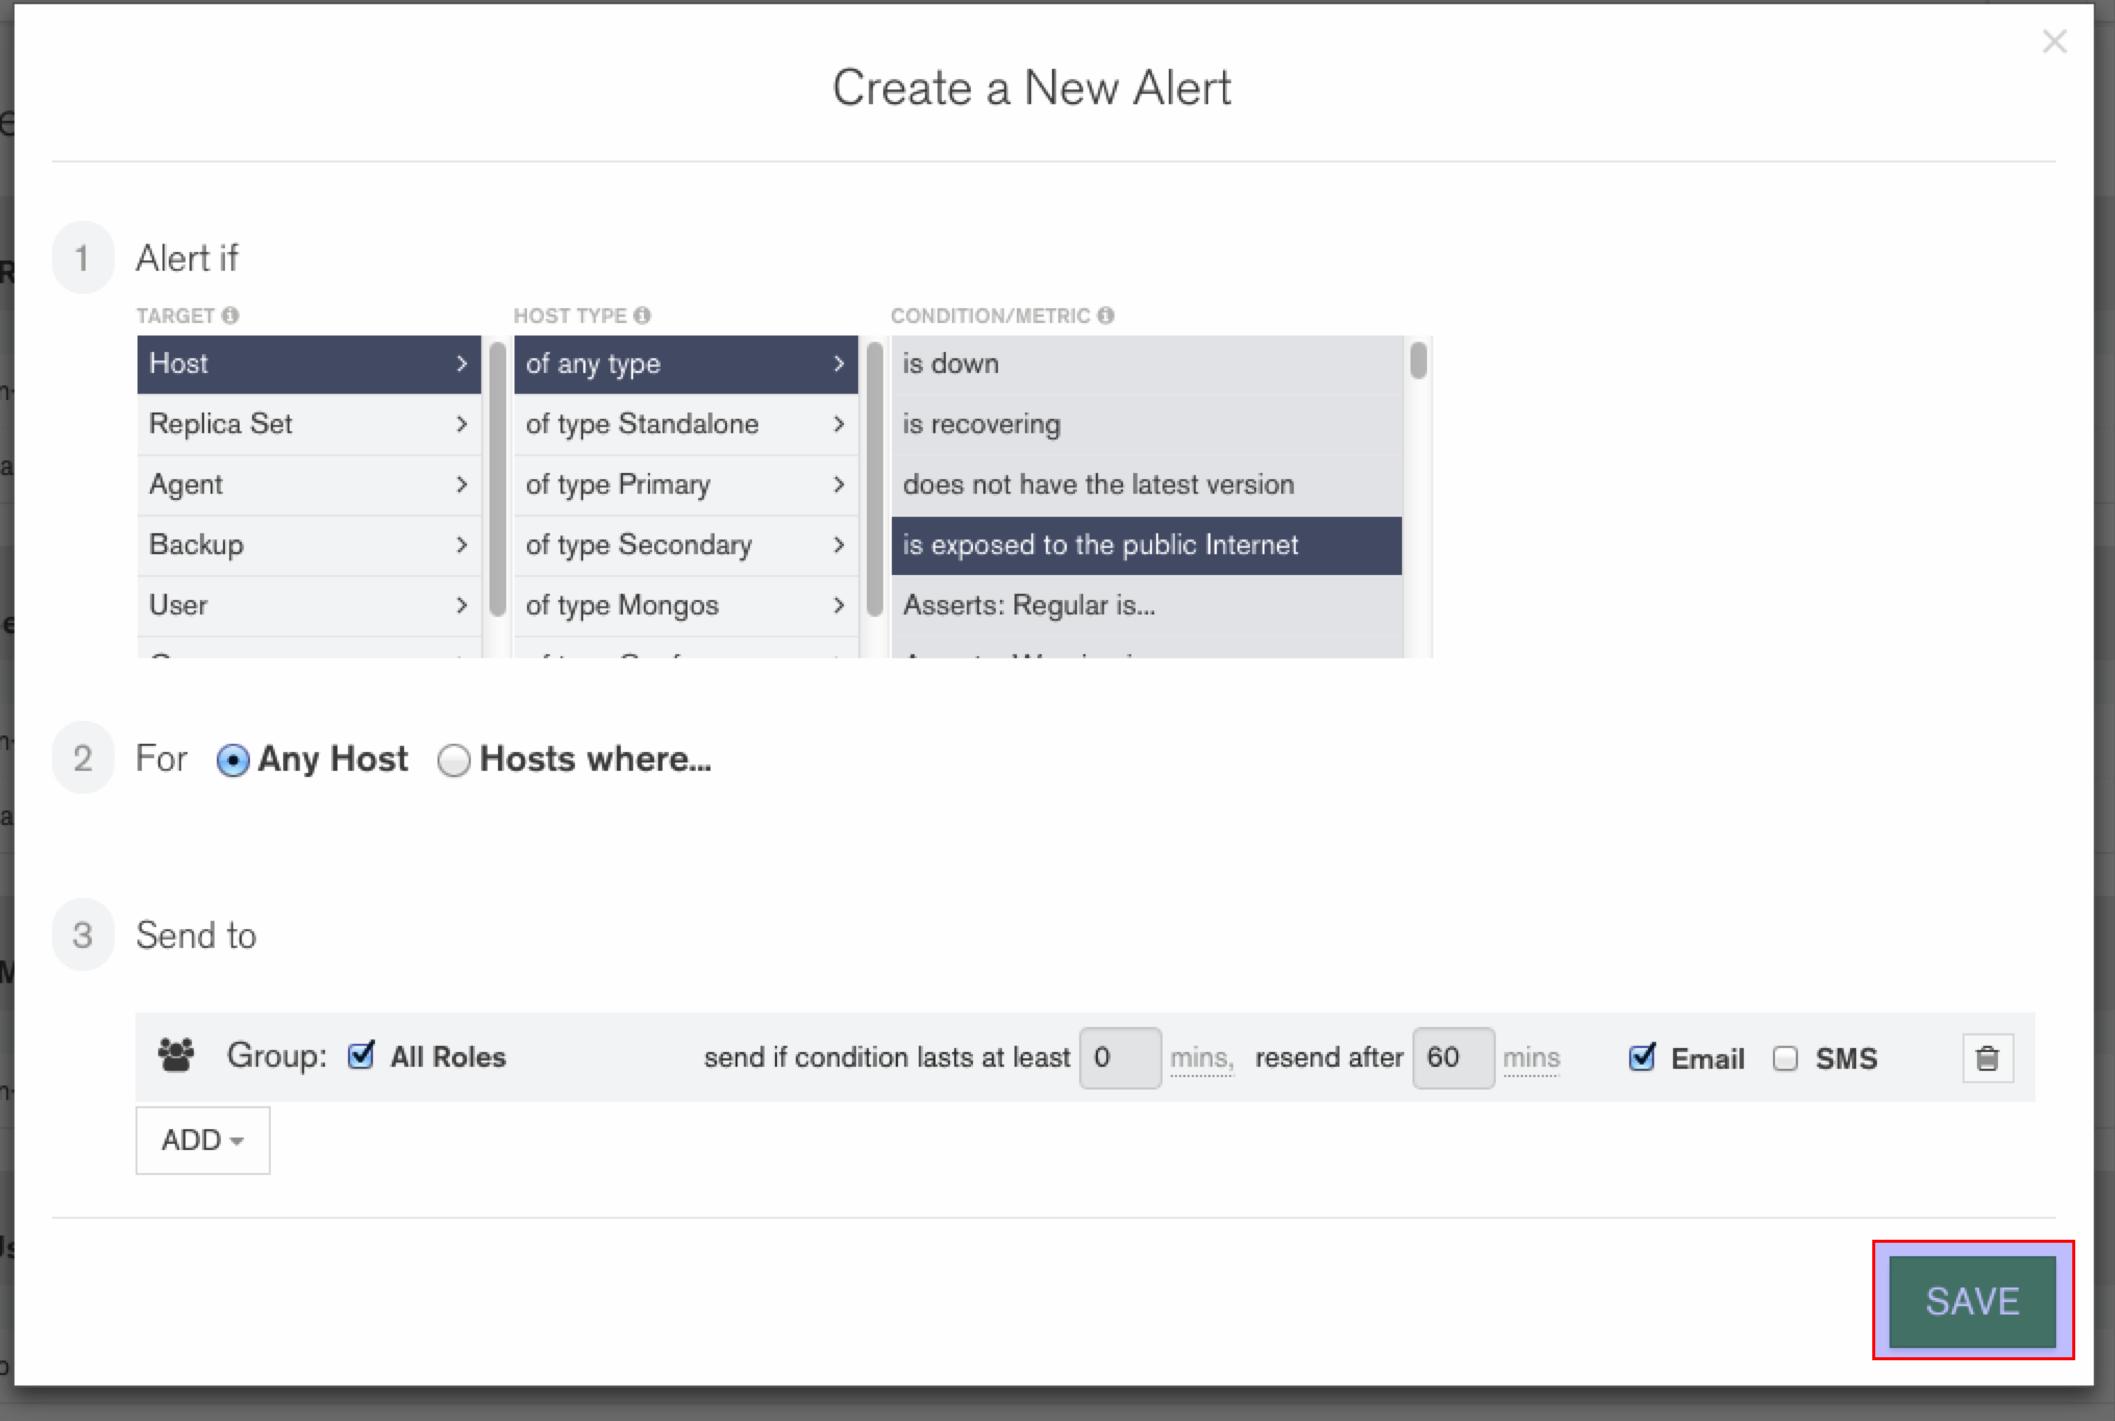 create_a_new_alert